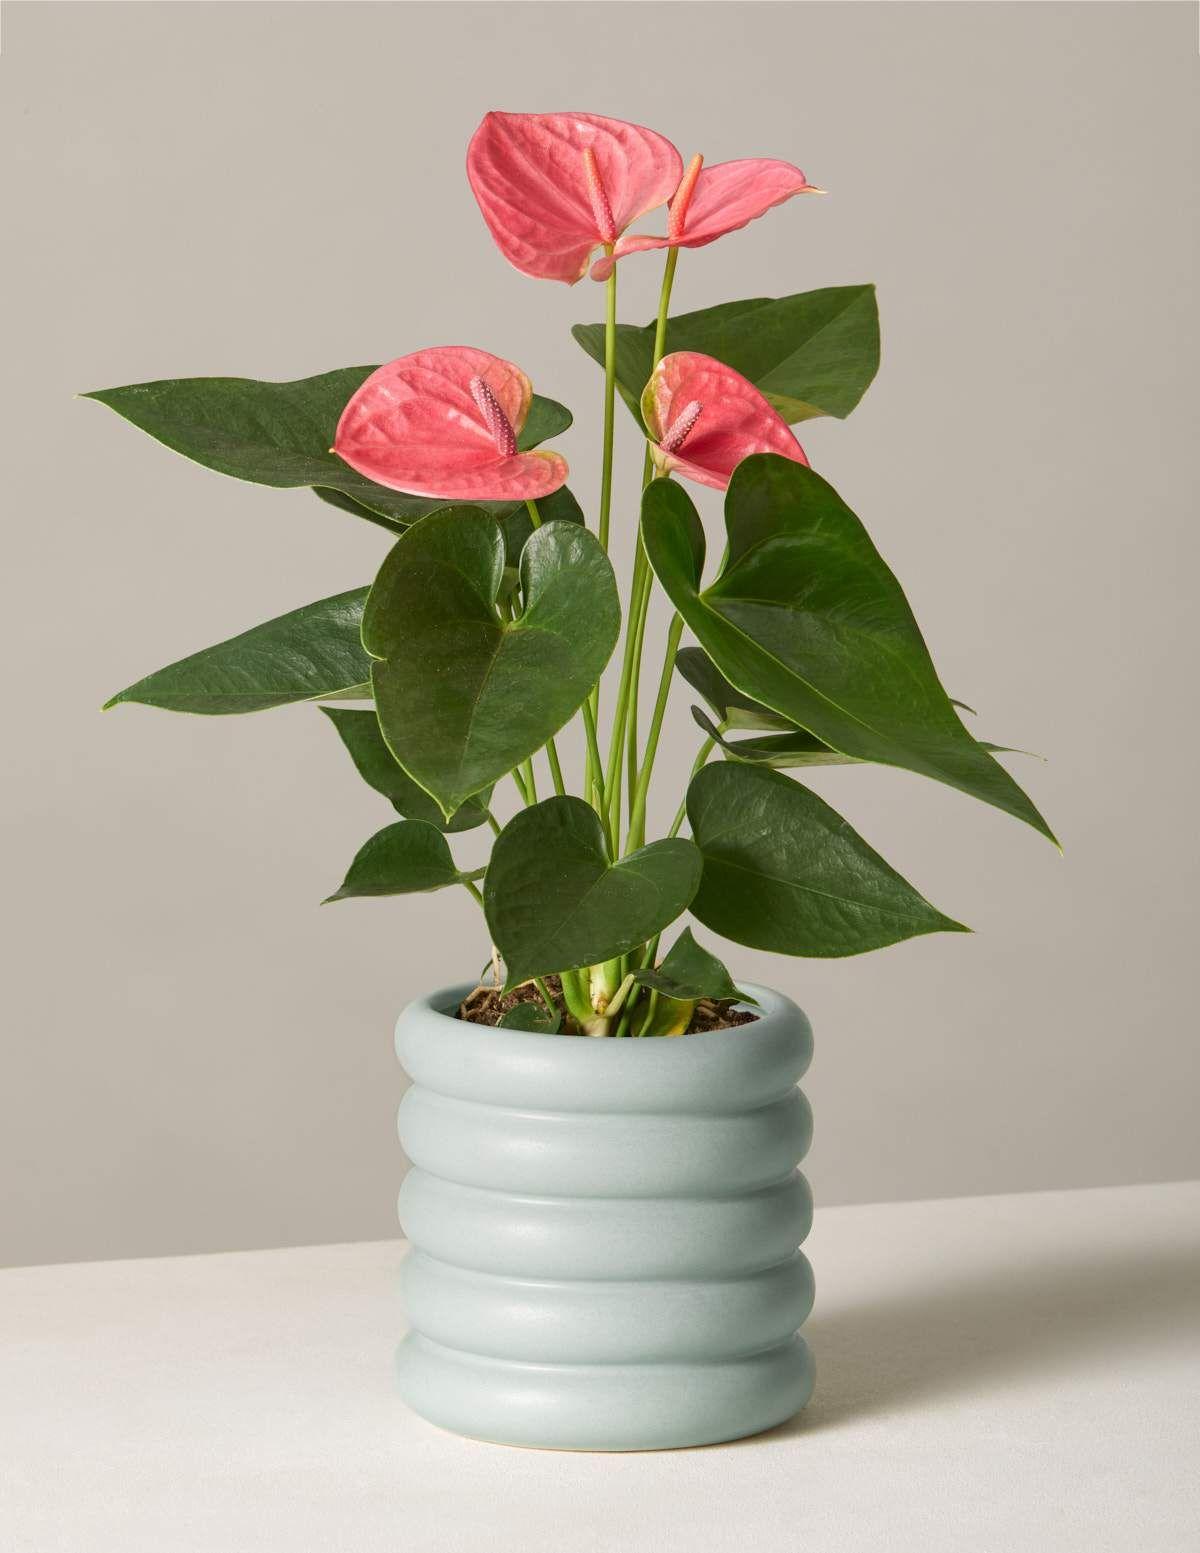 Pet Friendly Plants Monthly Subscription In 2020 Anthurium House Plants Plants